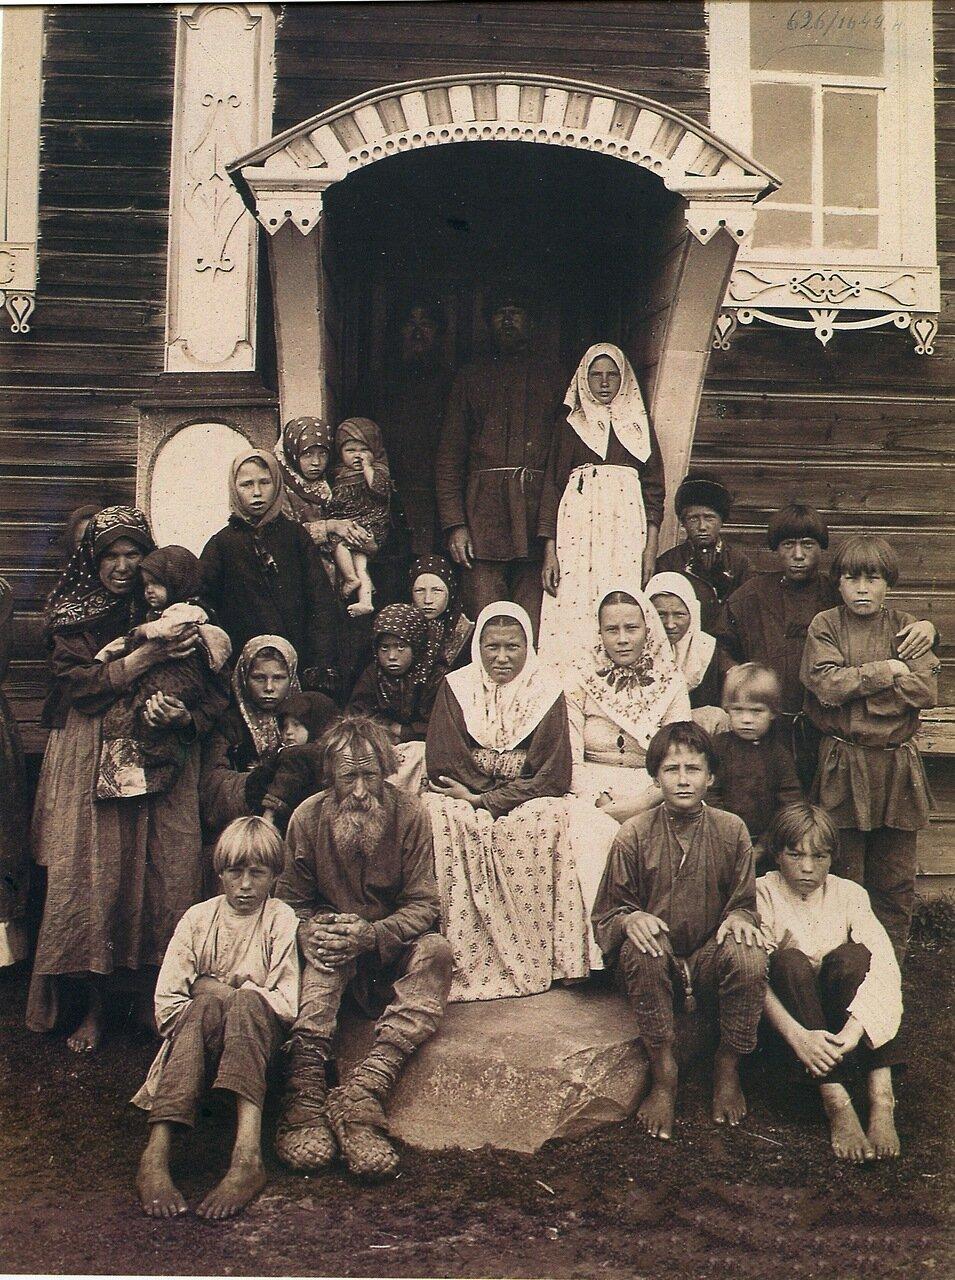 Группа старообрядцев. Деревня Кузнецово Семеновского уезда.